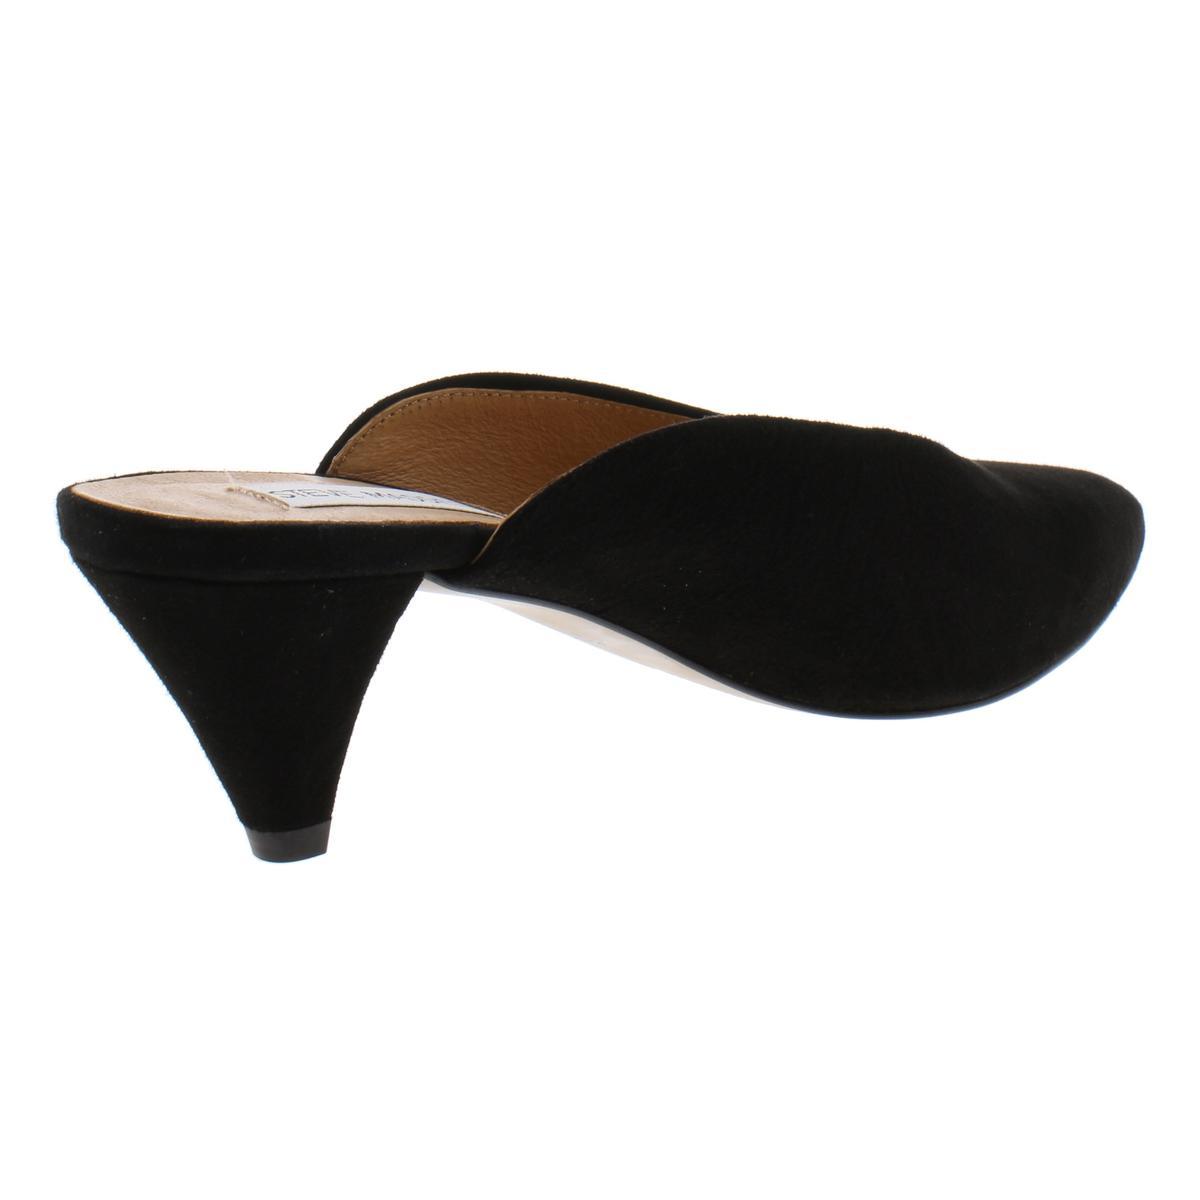 Steve-Madden-Womens-Fiesta-Leather-Pointed-Toe-Dress-Mules-Heels-BHFO-0632 thumbnail 4